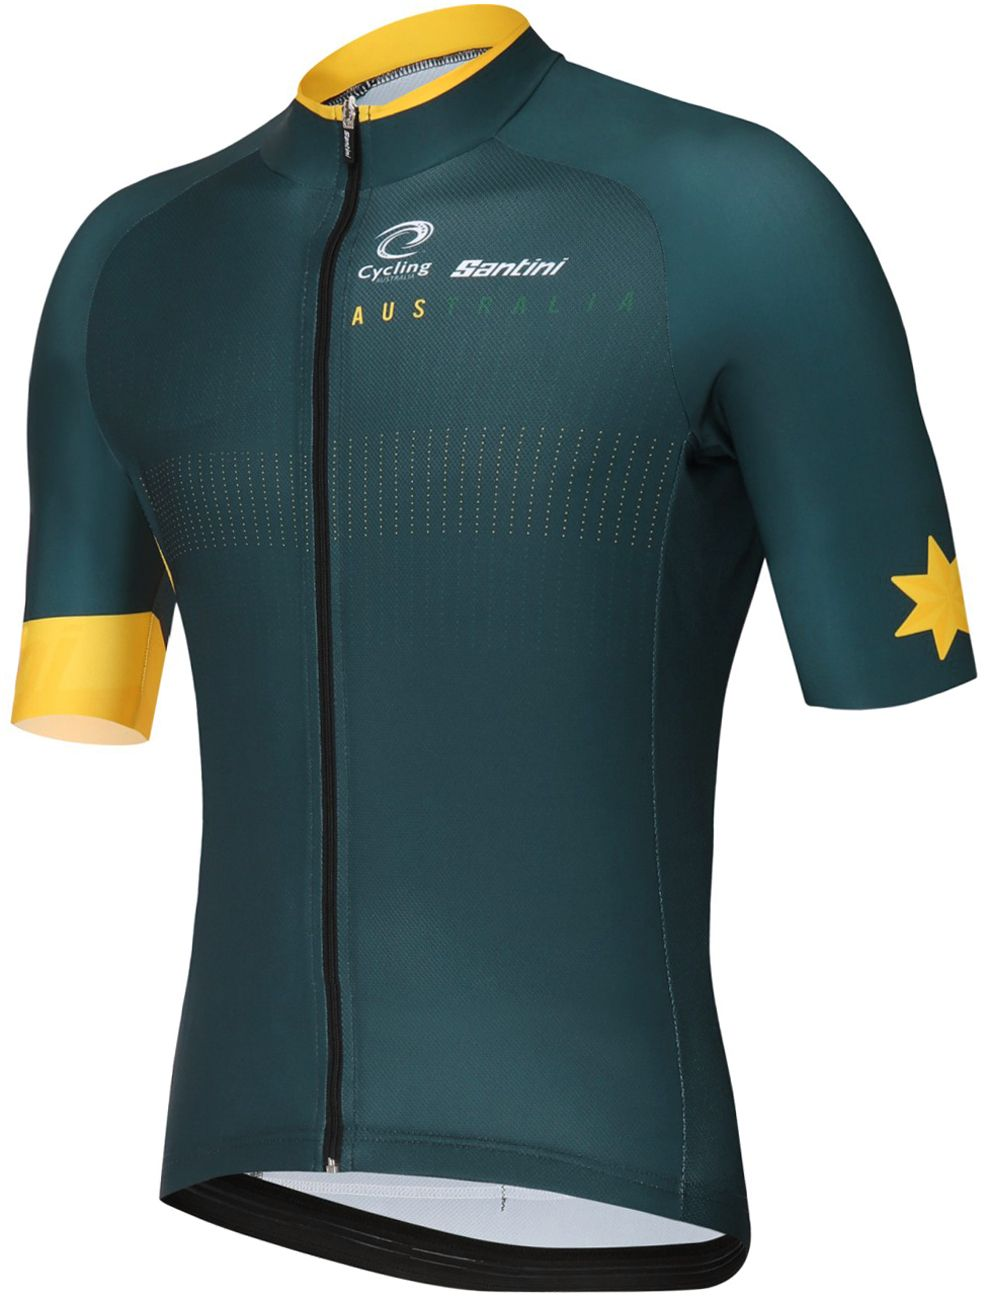 ... Santini national cycling team. Next 704671406